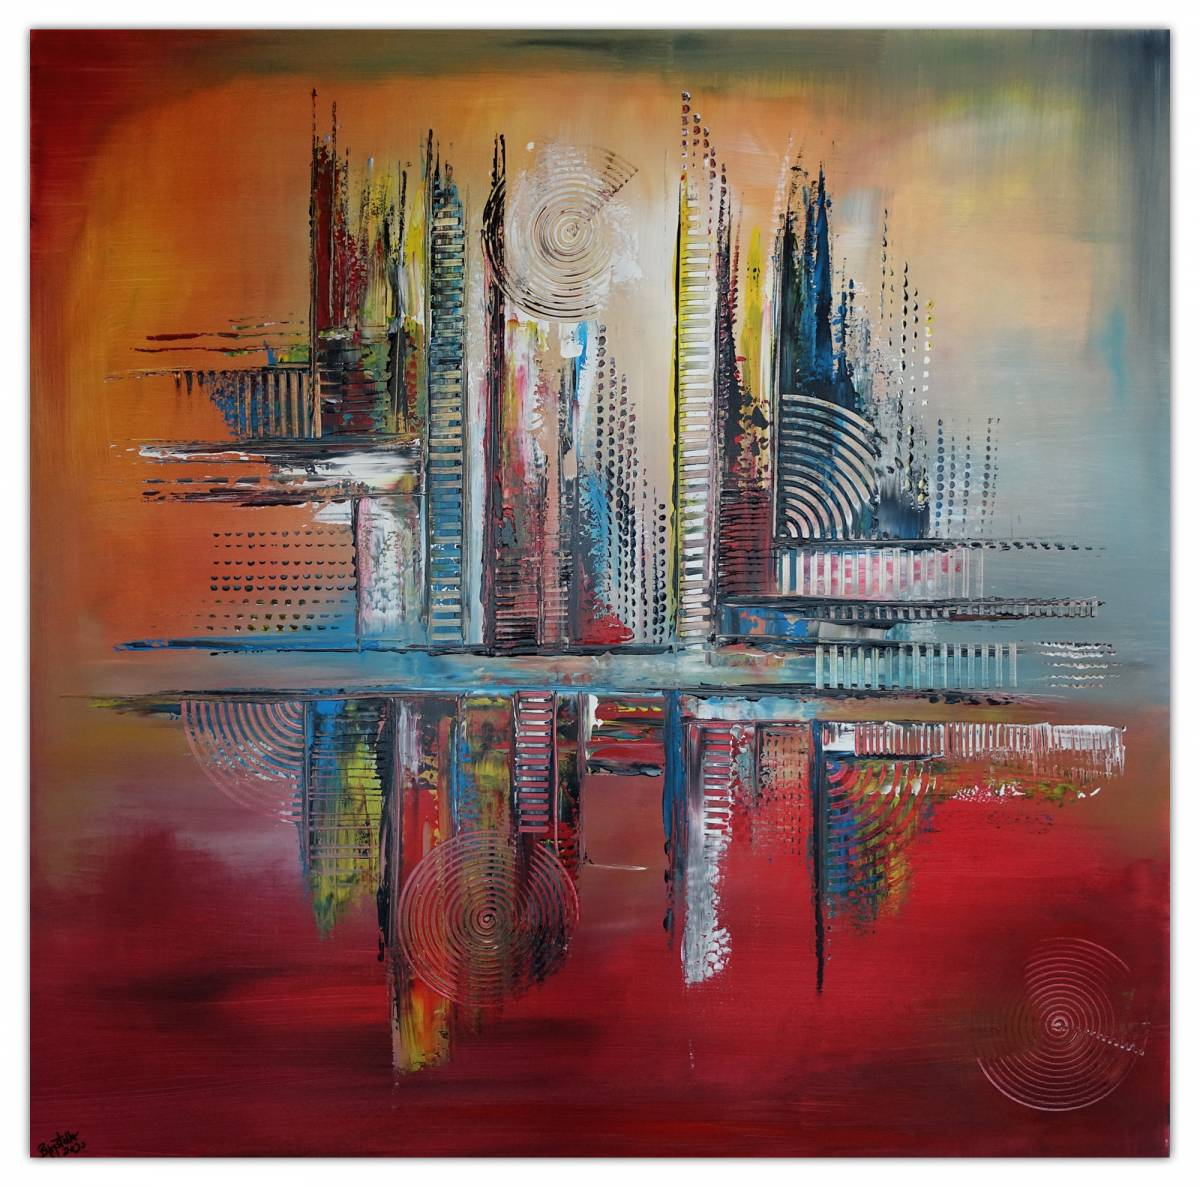 'Emperial abstrakte Malerei Leinwandbild Wandbild Kunstbild Gemälde Acrylbild 100x100' von  Burgstallers Art Gemaelde